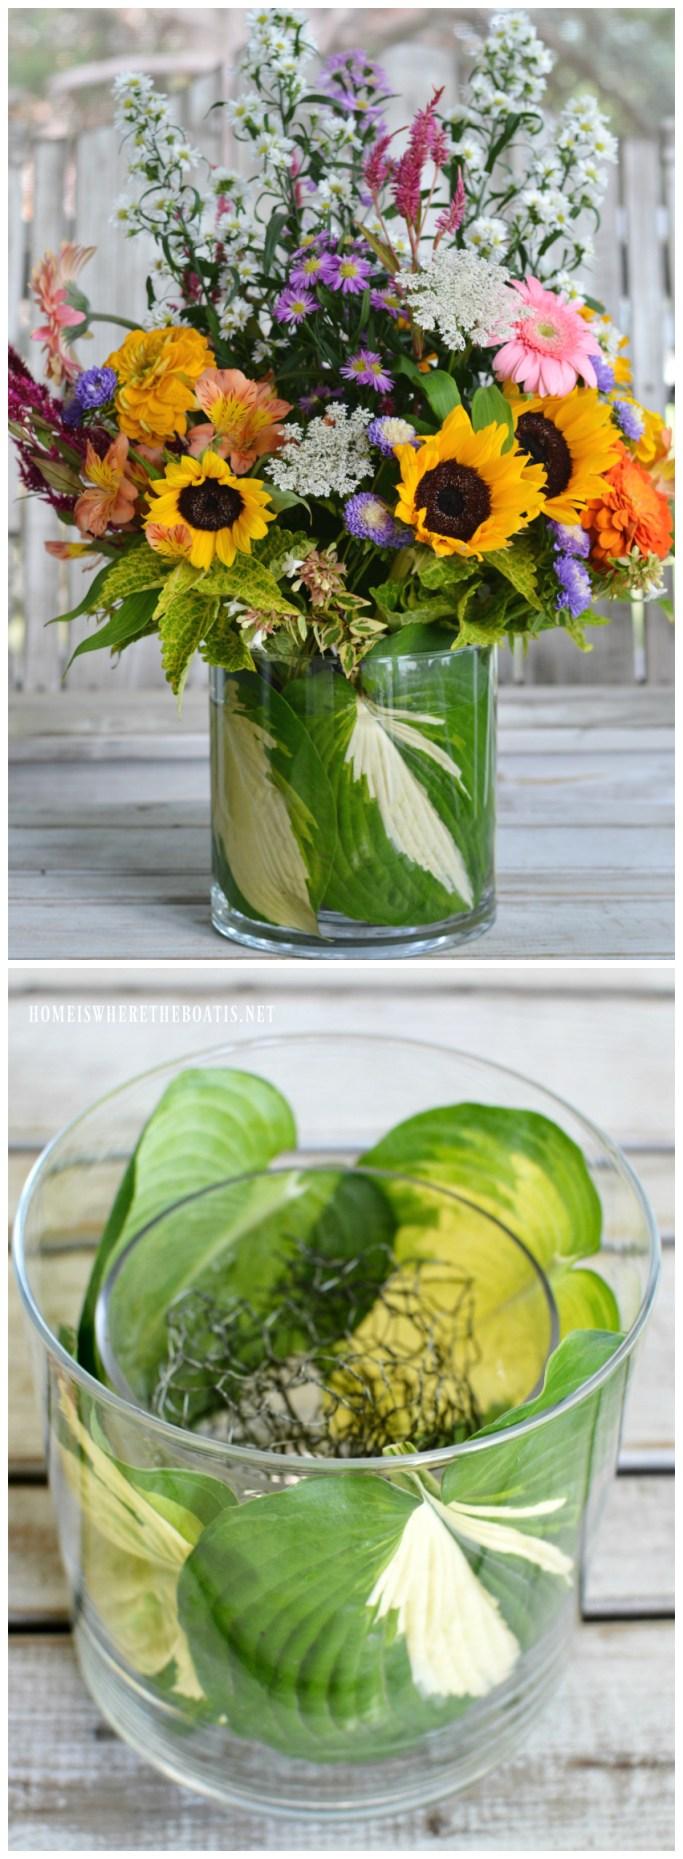 Flower arrangement using hosta leaves to conceal chicken wire in smaller glass vase | ©homeiswheretheboatis.net #flowerarranging #flowers